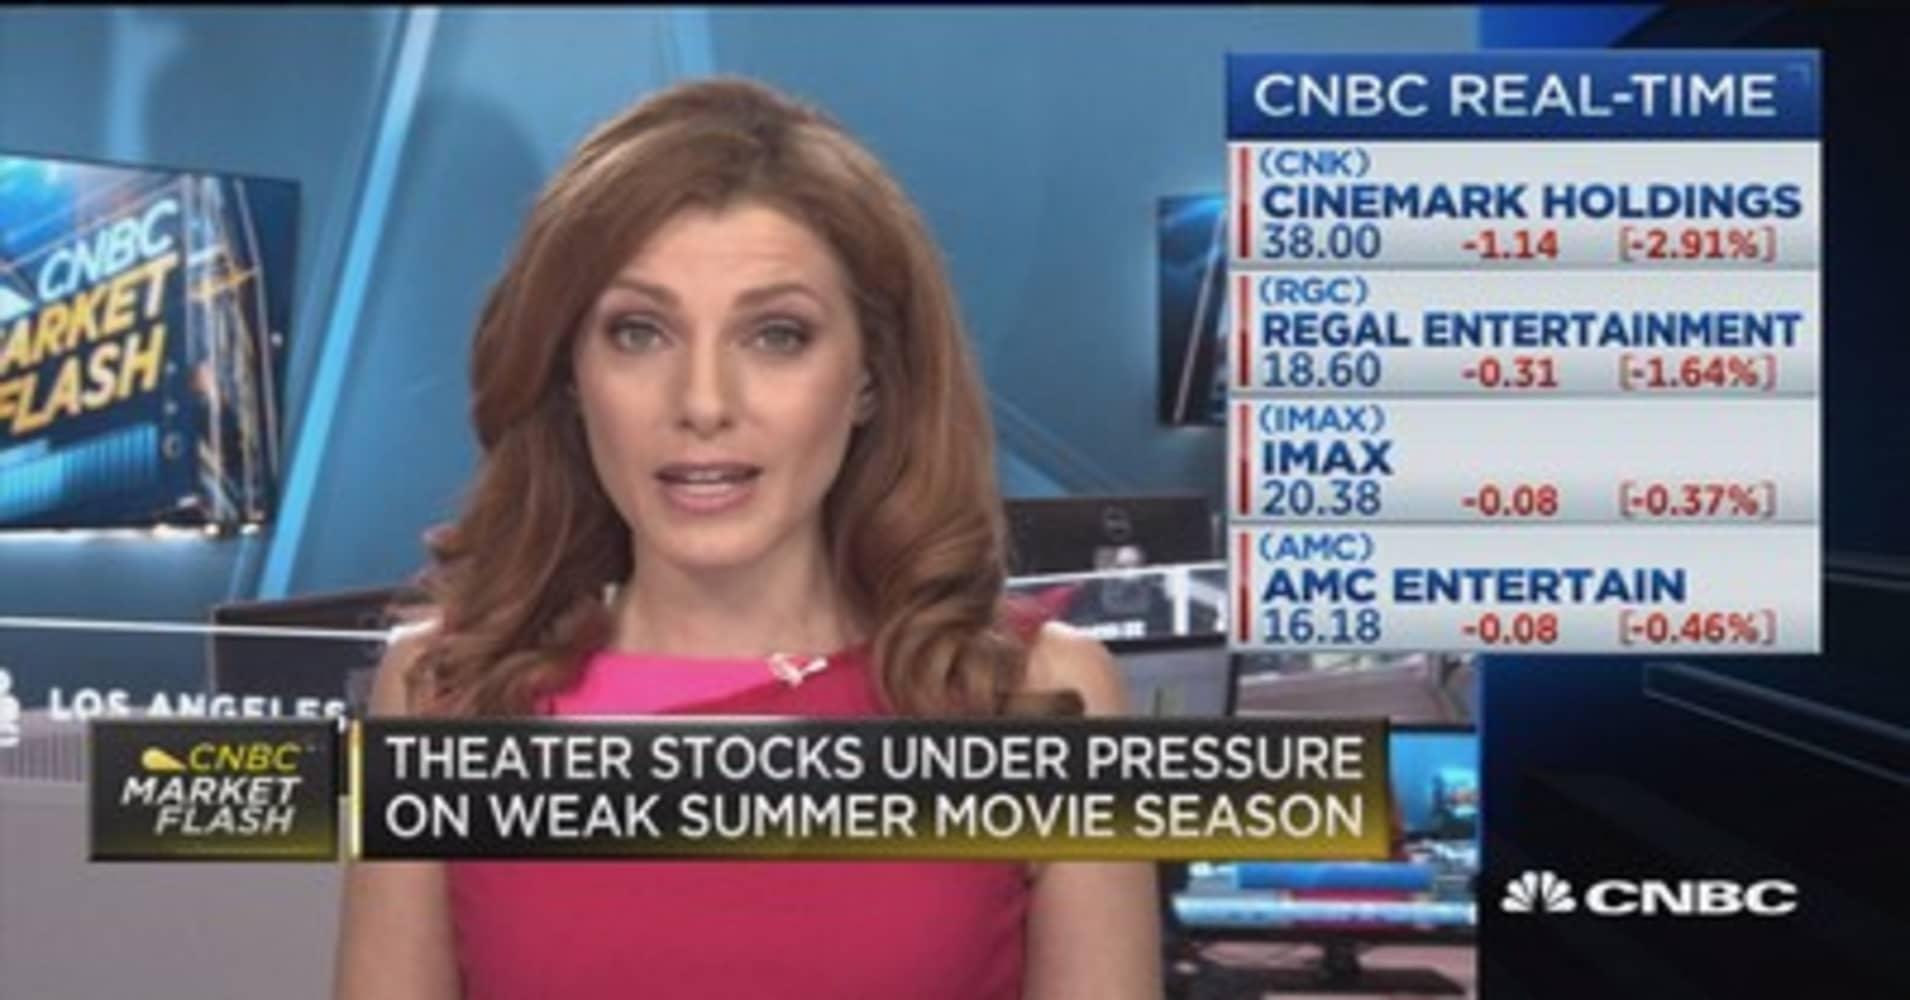 theater stocks under pressure on weak summer movie season